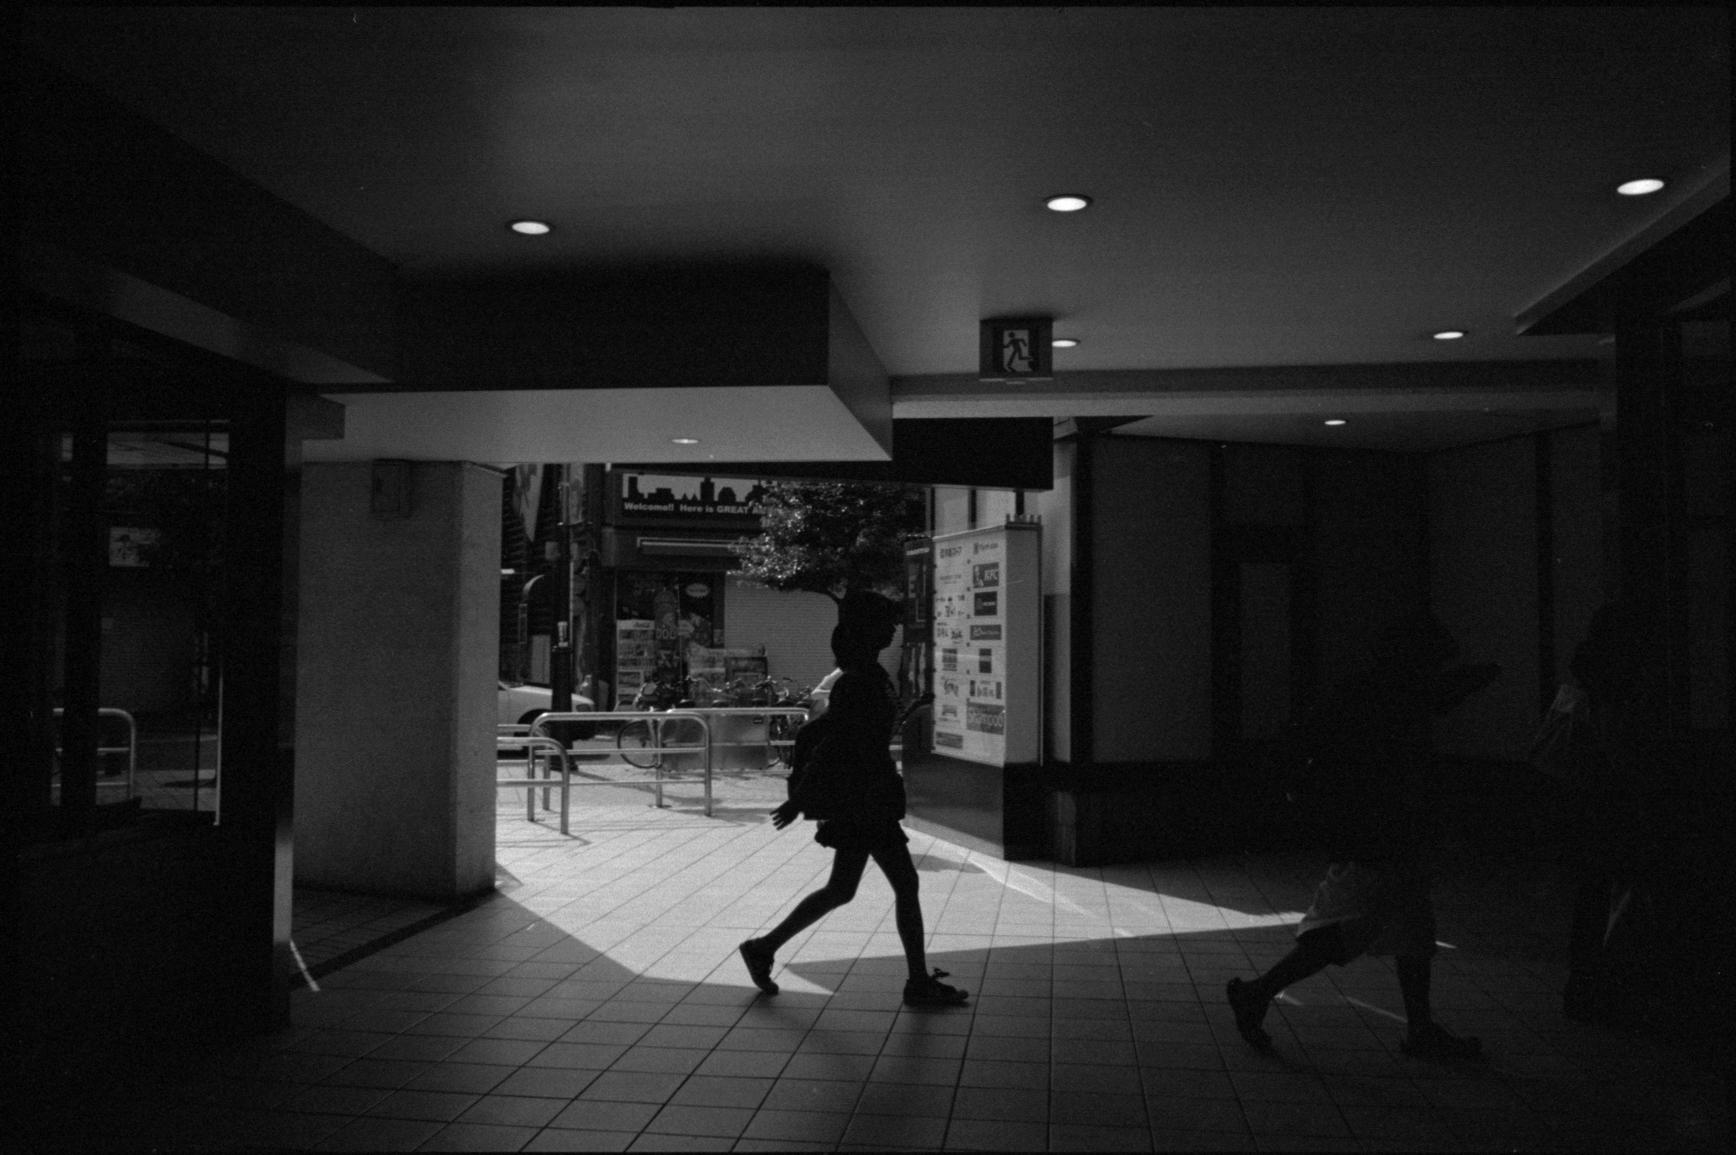 20140619 LeicaM4-P Elmarit28 400TX TMD 033